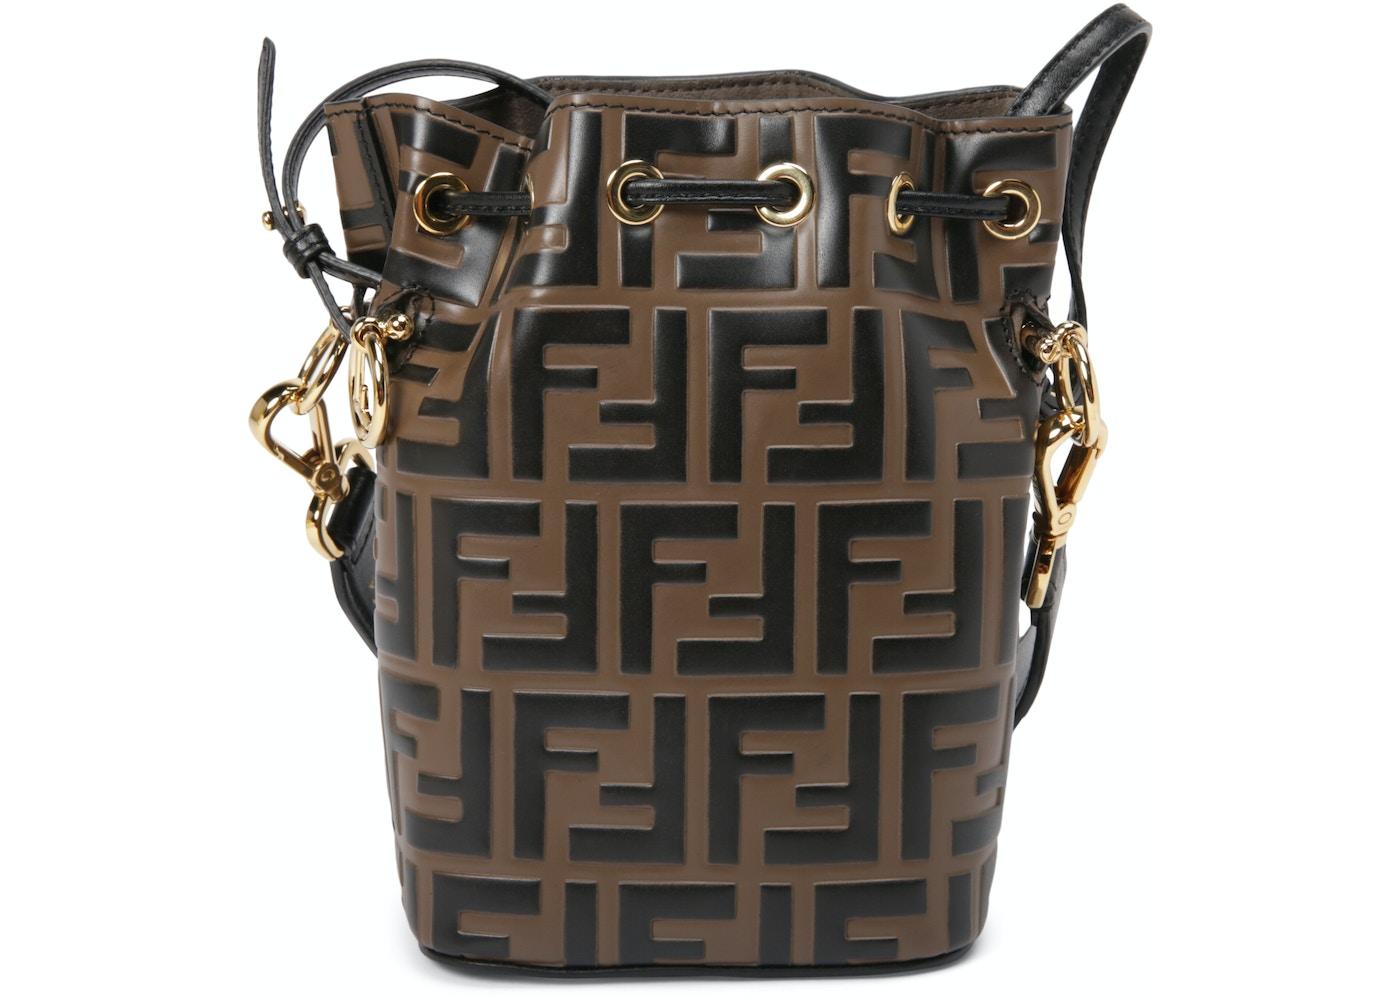 3208d3678c0b Buy   Sell Luxury Handbags